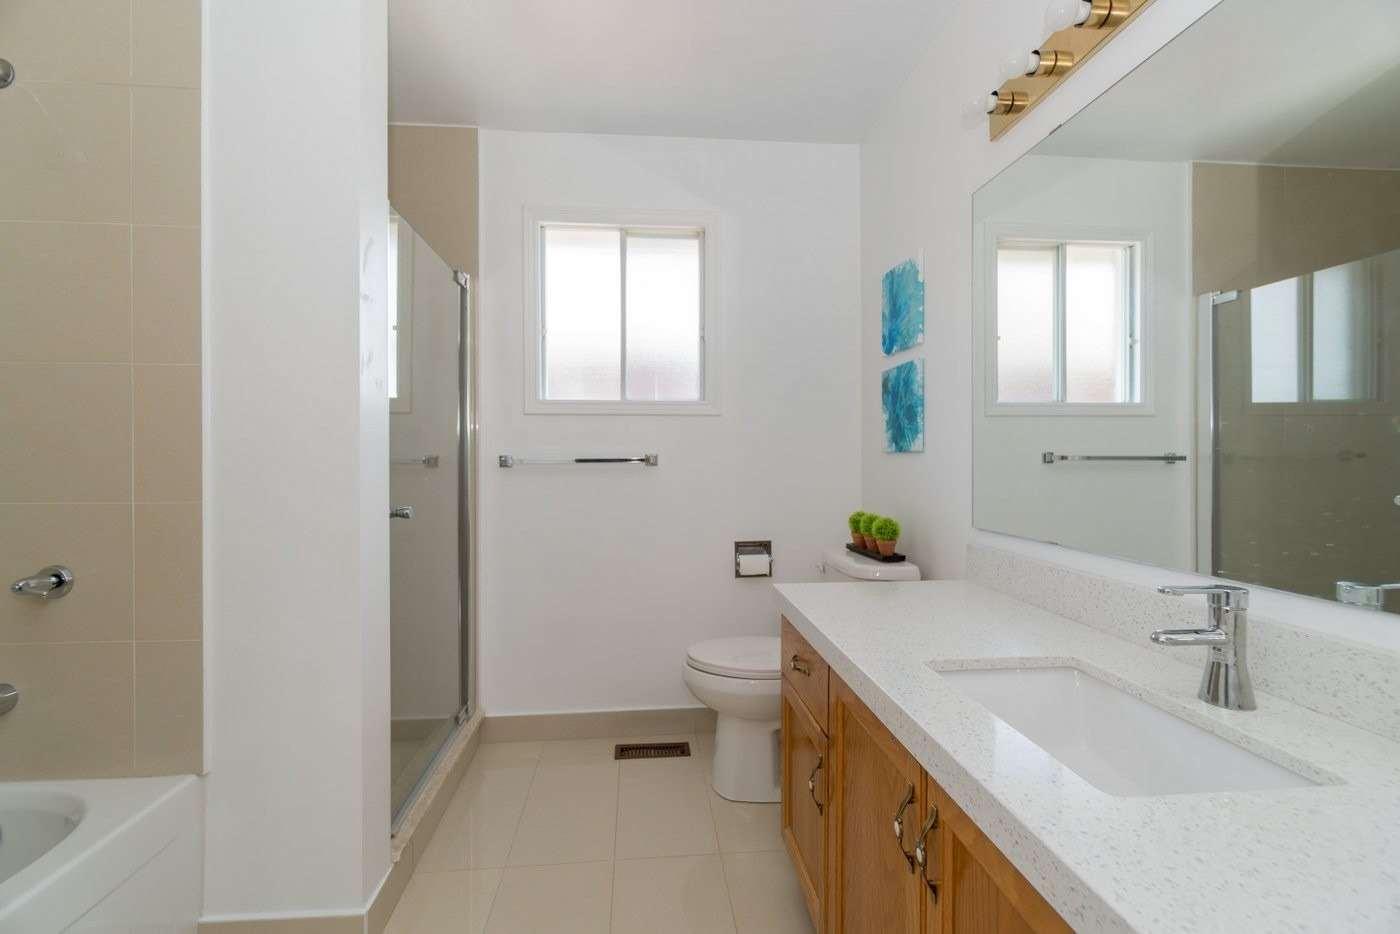 970 White Clover Way, Mississauga W4552450